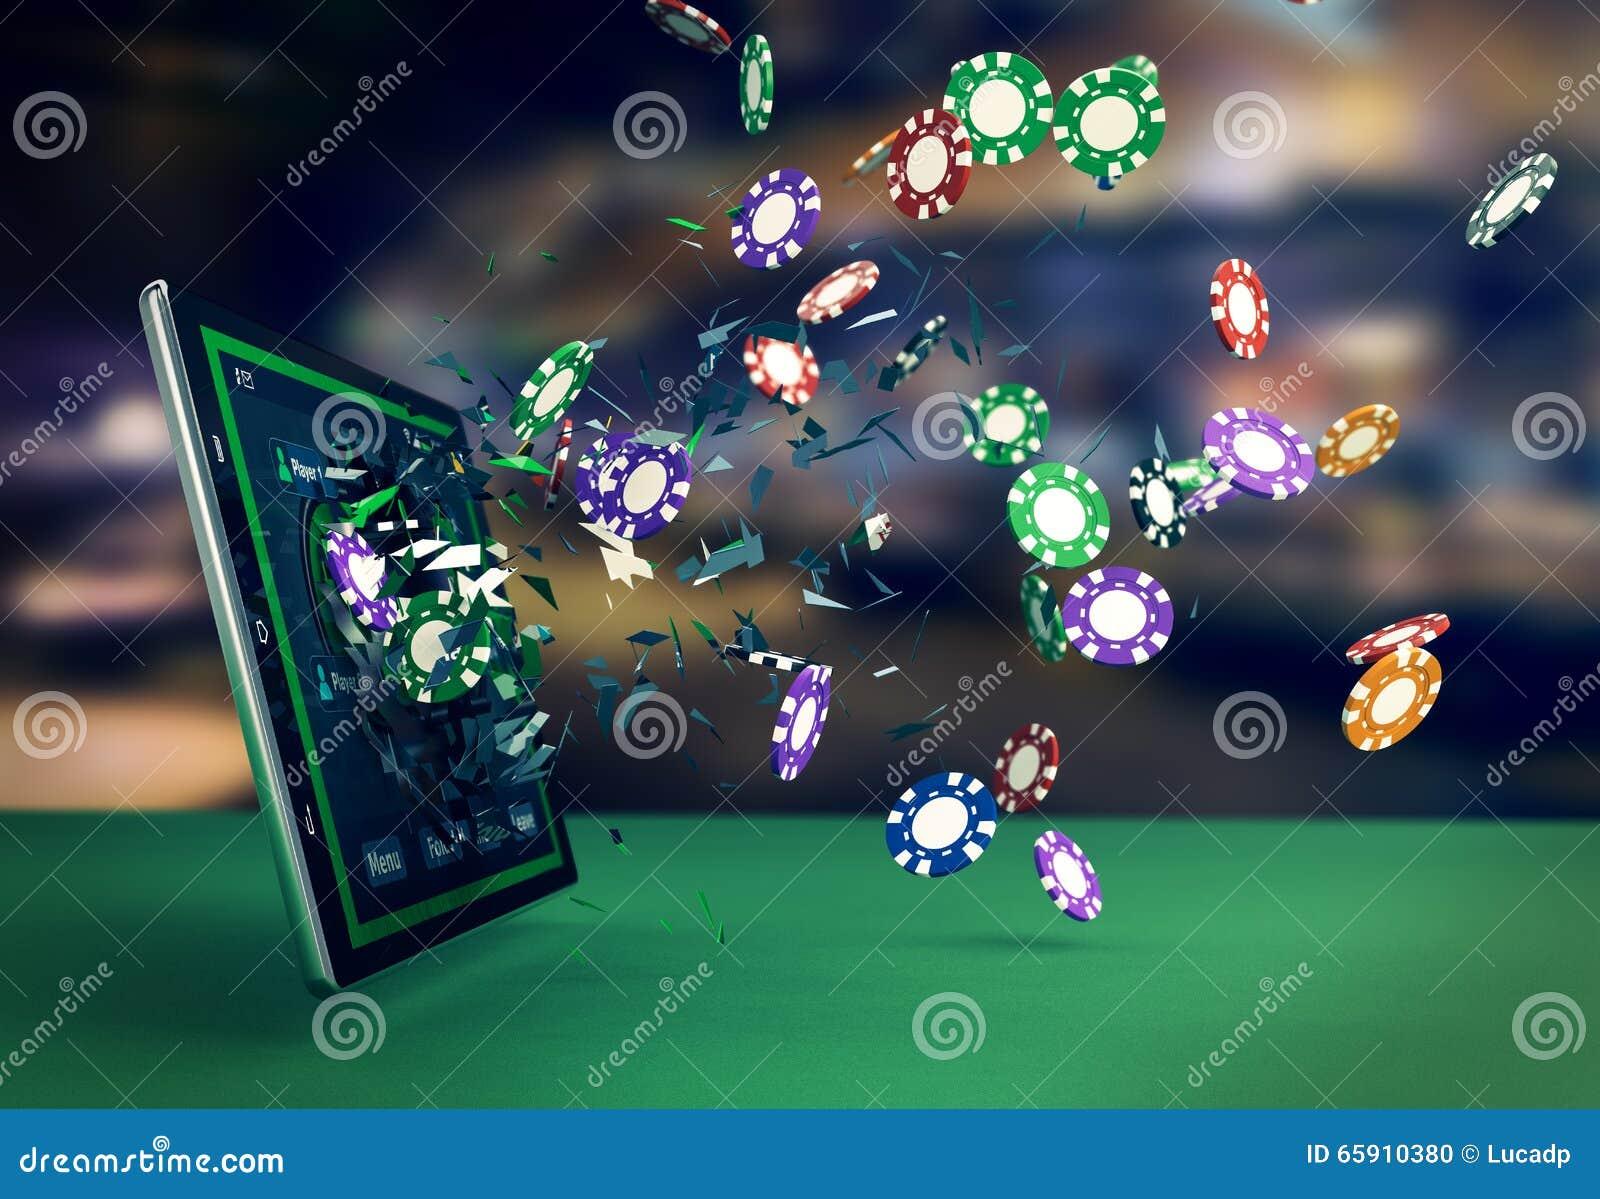 pokerstars ipad app cashier